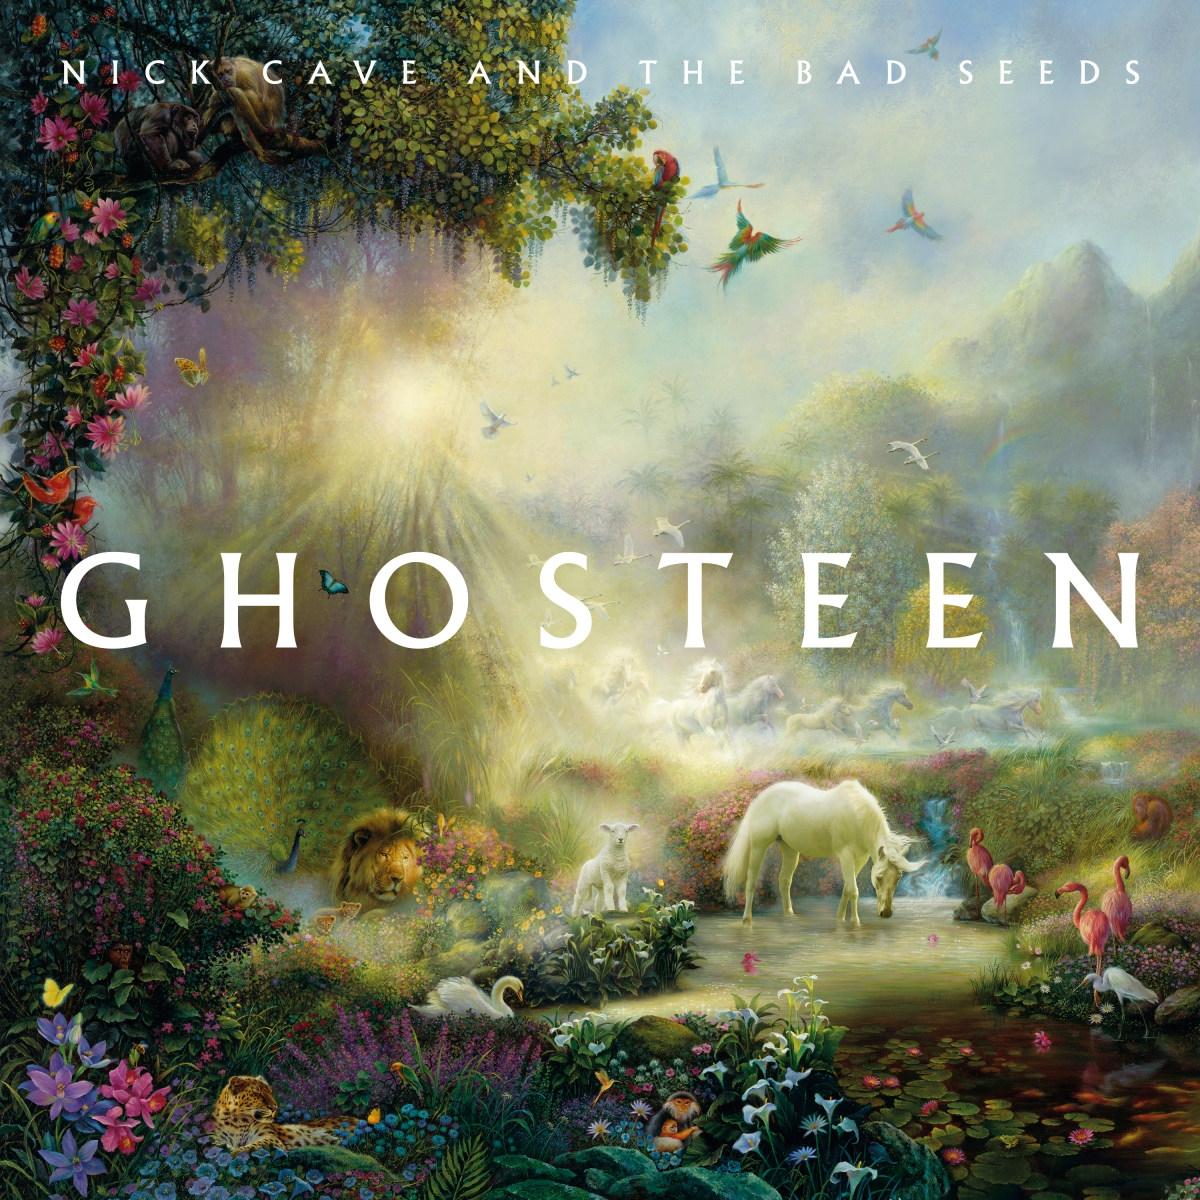 Ghosteen - Nick Cave & the Bad Seeds - Musik - Ghosteen Ltd - 5056167114796 - November 8, 2019